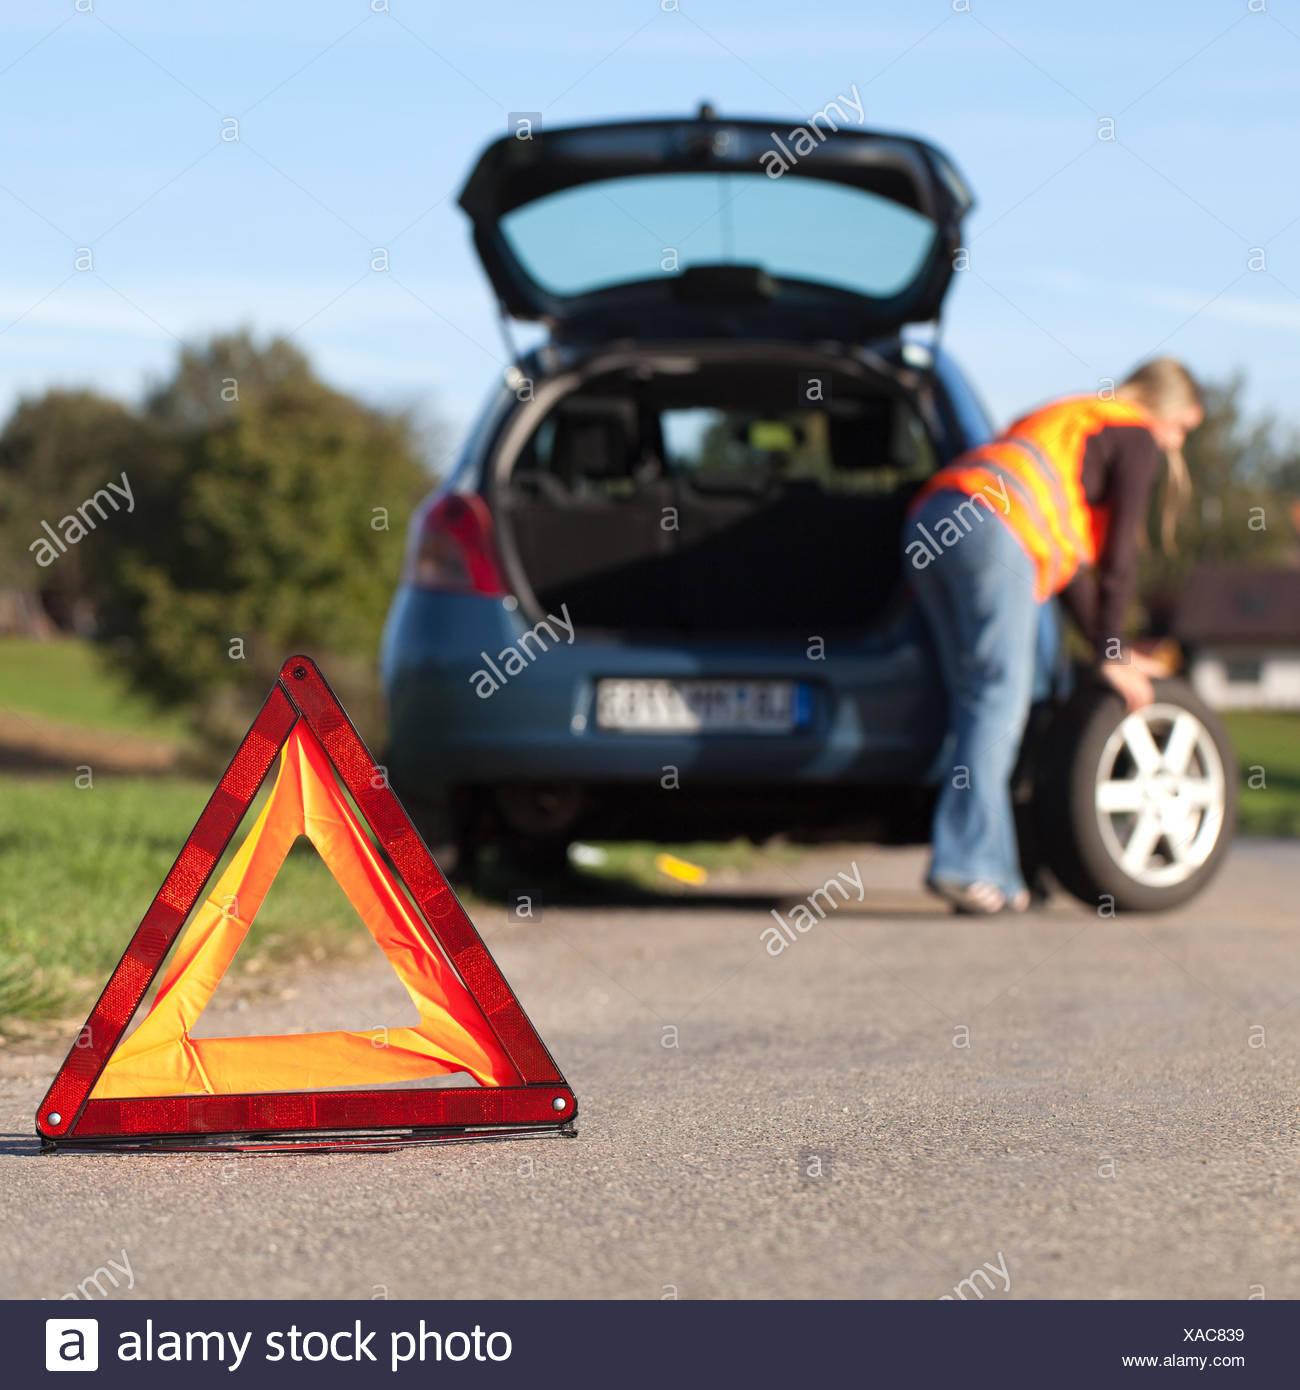 Reifenpanne am Auto - Stock Image